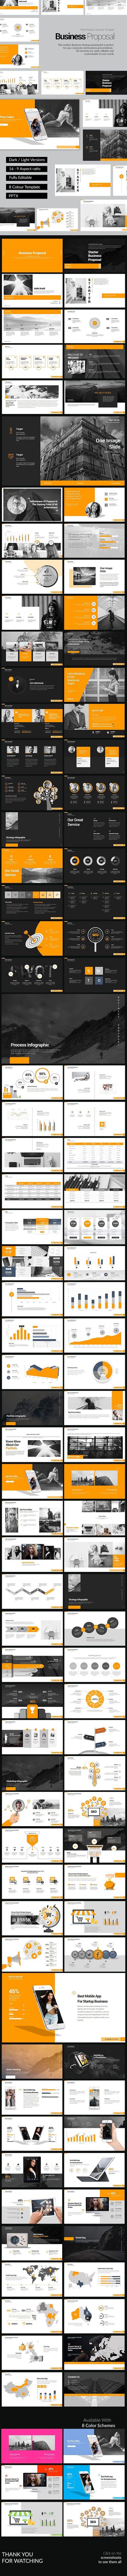 1000 design powerpoint template pinterest slides business proposal powerpoint design template powerpoint templates presentation design template download here https alramifo Gallery